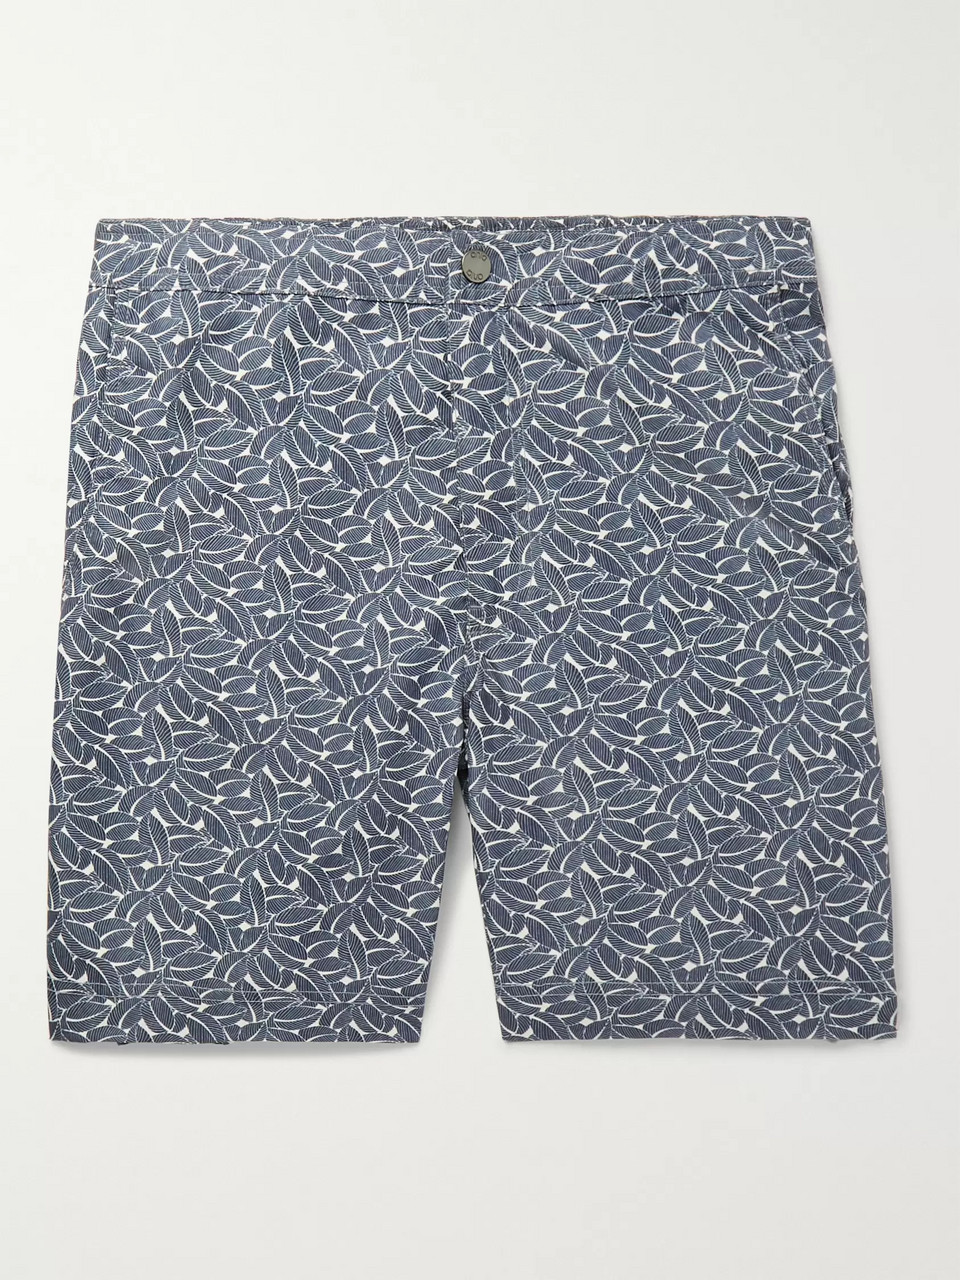 696e2194d895b Swim Shorts & Swimwear | Designer Menswear | MR PORTER